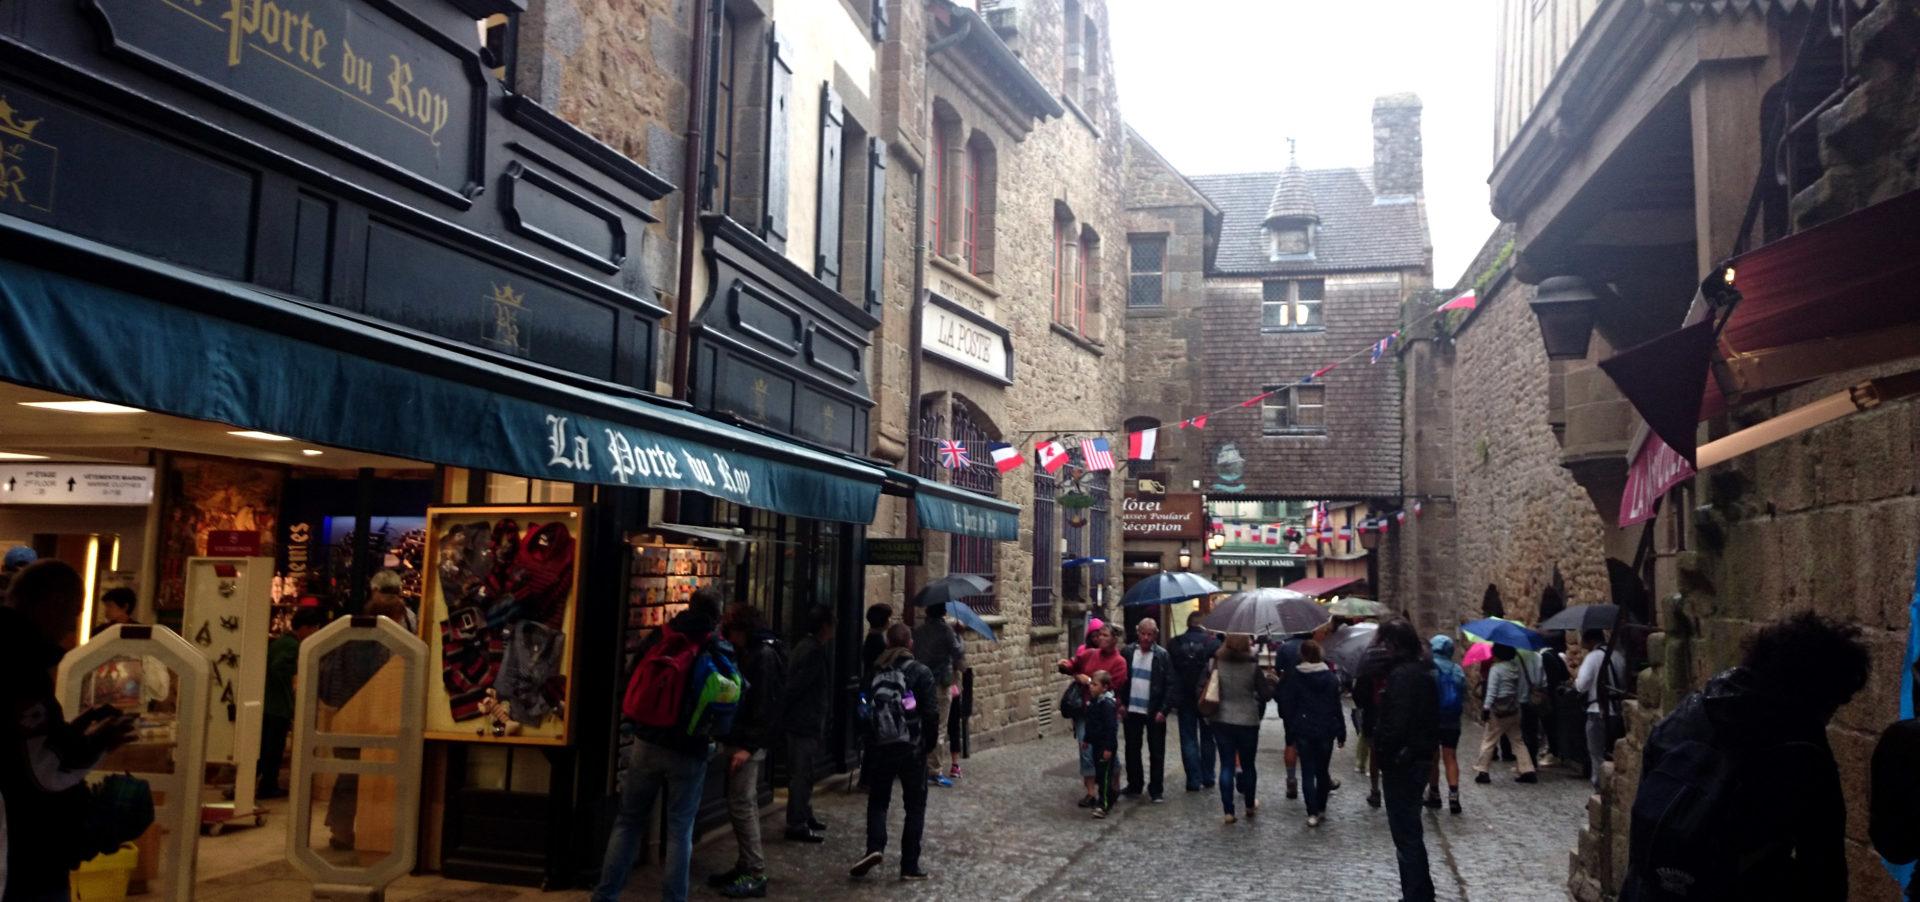 grand rue mont saint michel normandia